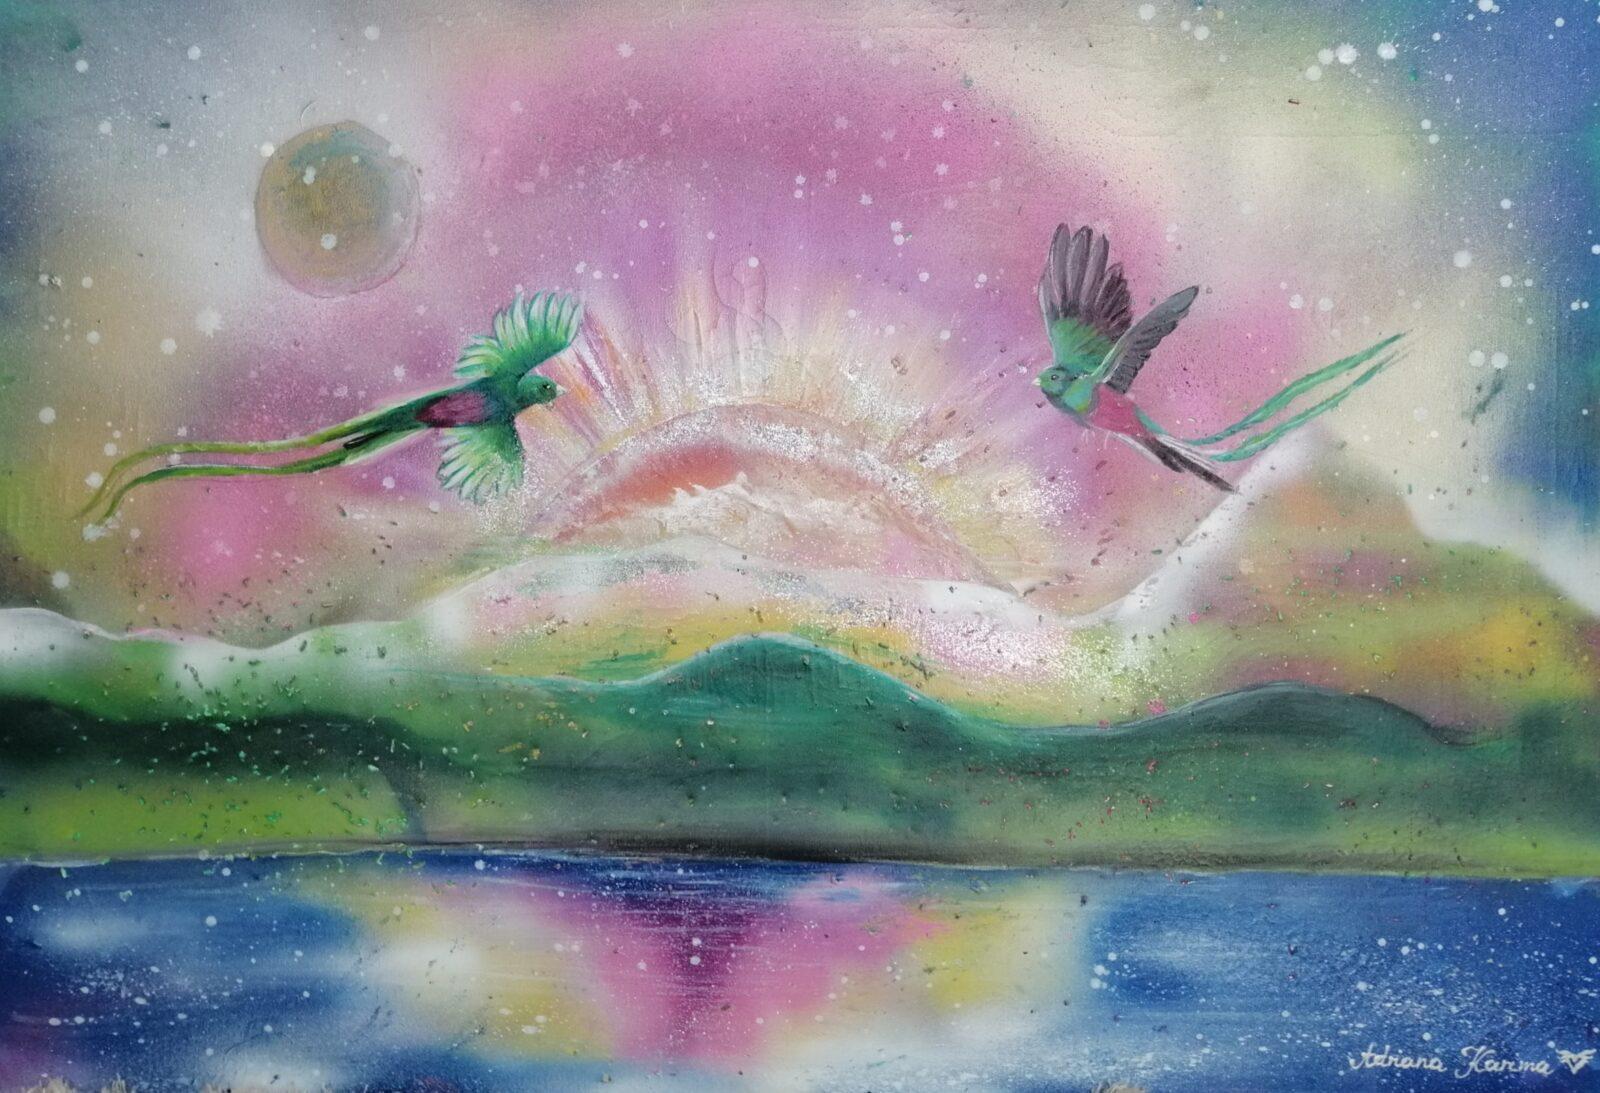 Quetzal Dance - Ariana Karima